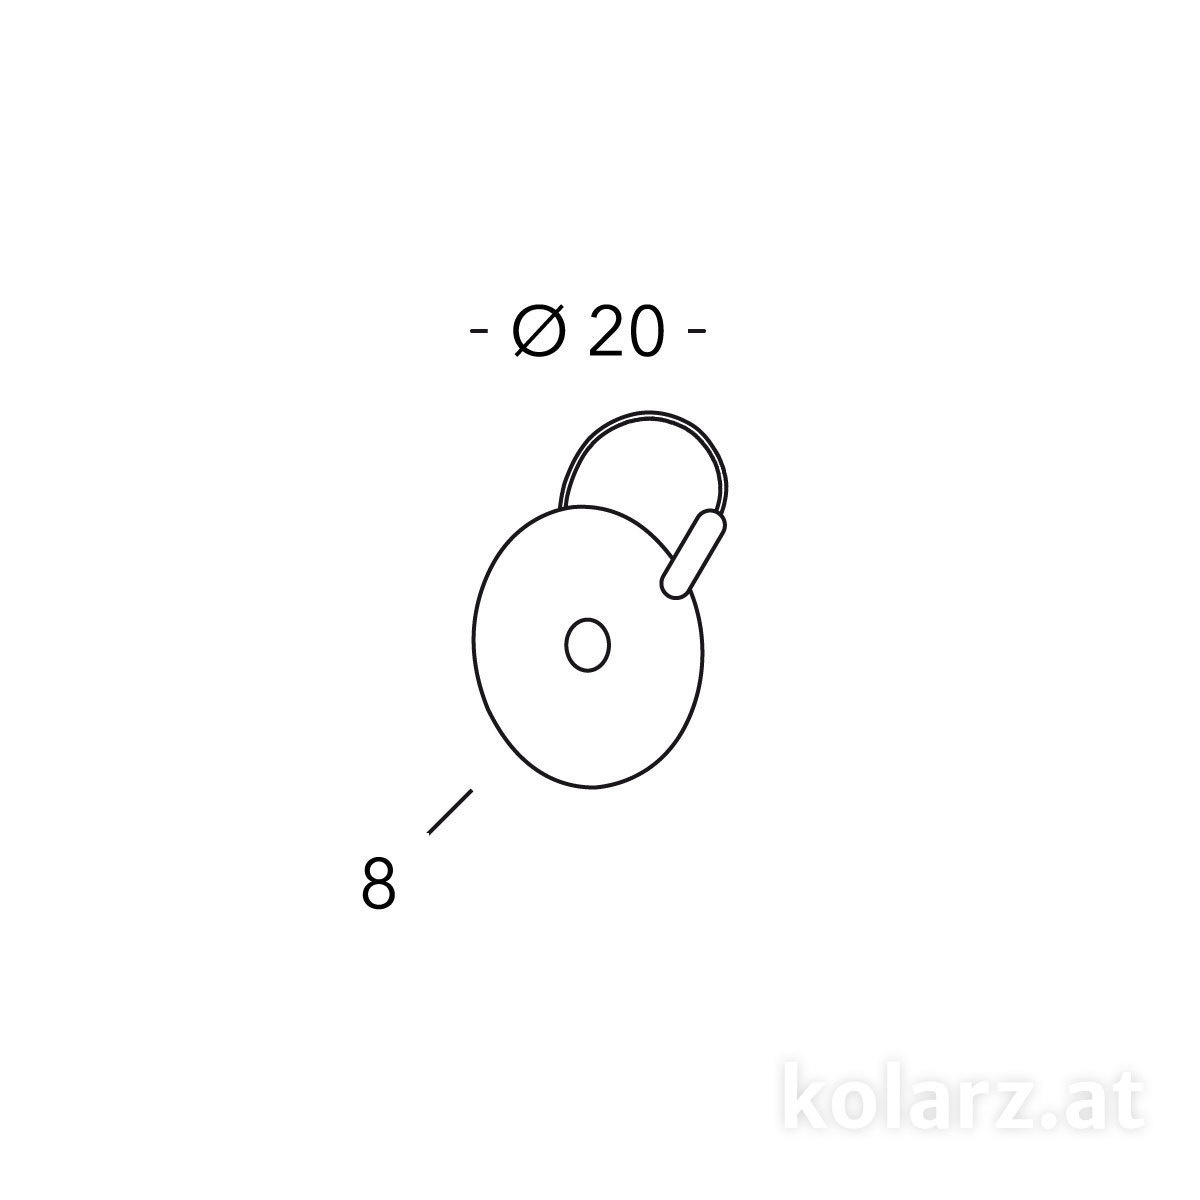 5110-60150-000__tc15-s1.jpg